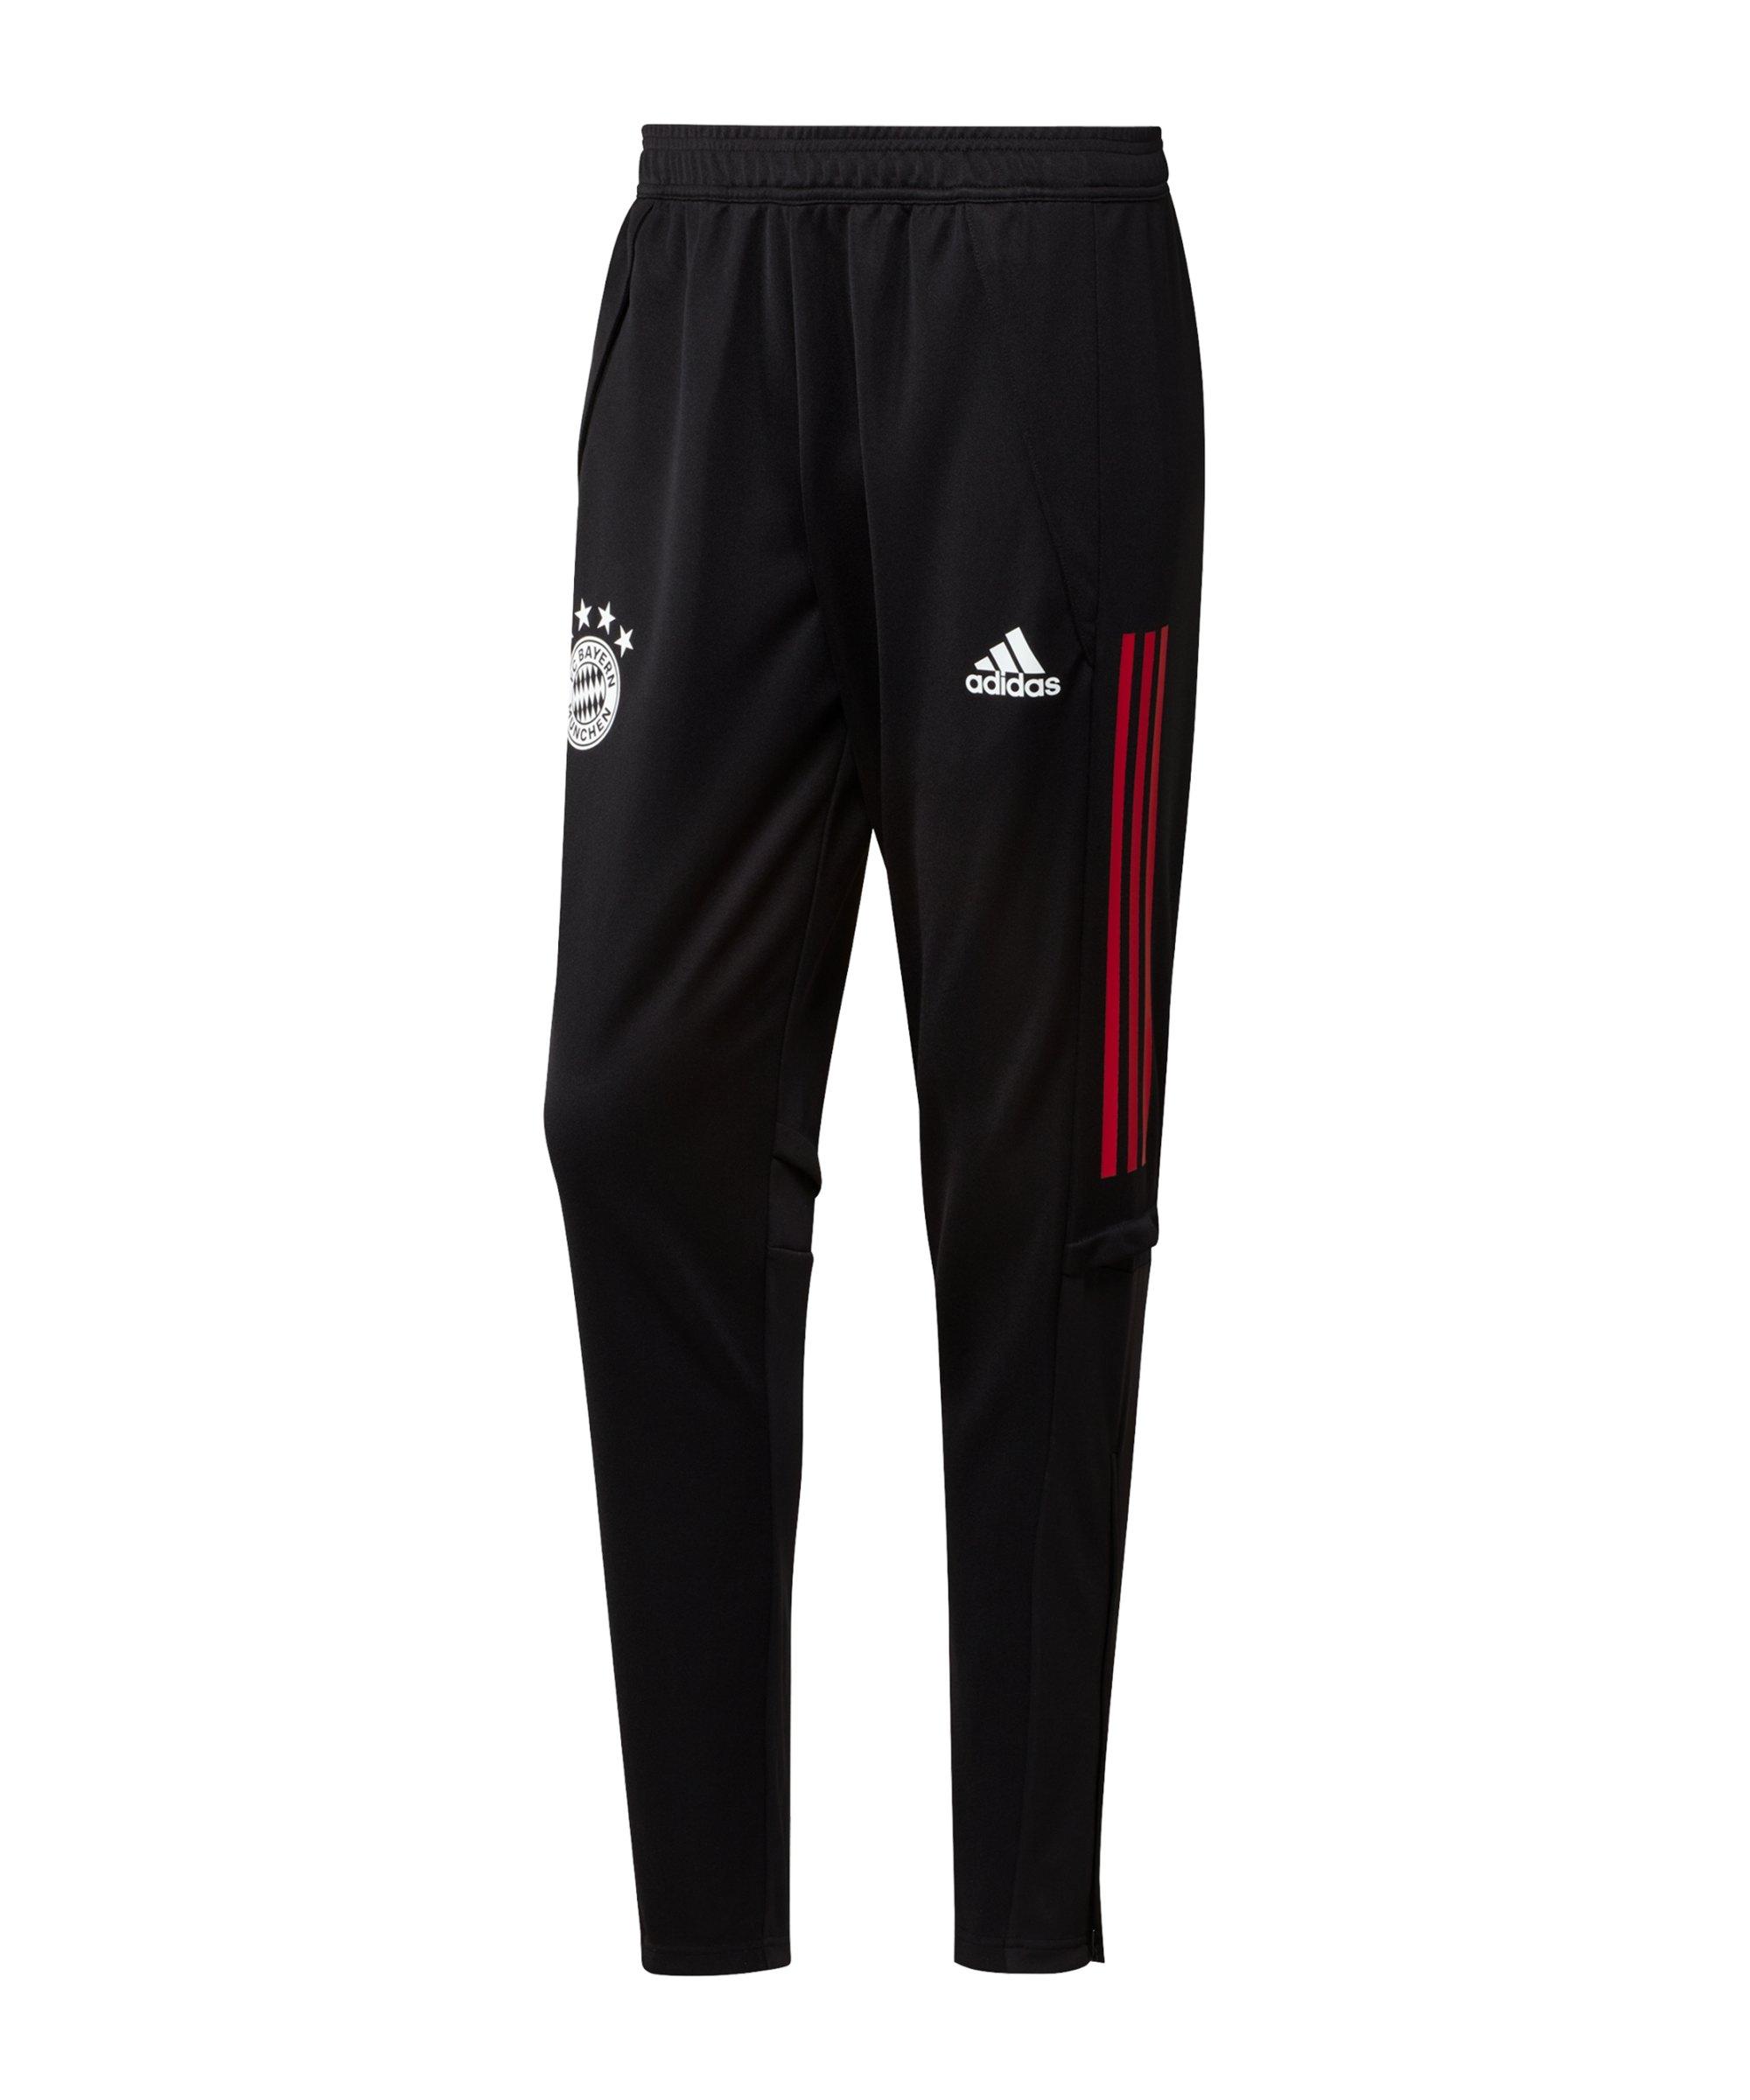 adidas FC Bayern München Trainingshose Schwarz - schwarz